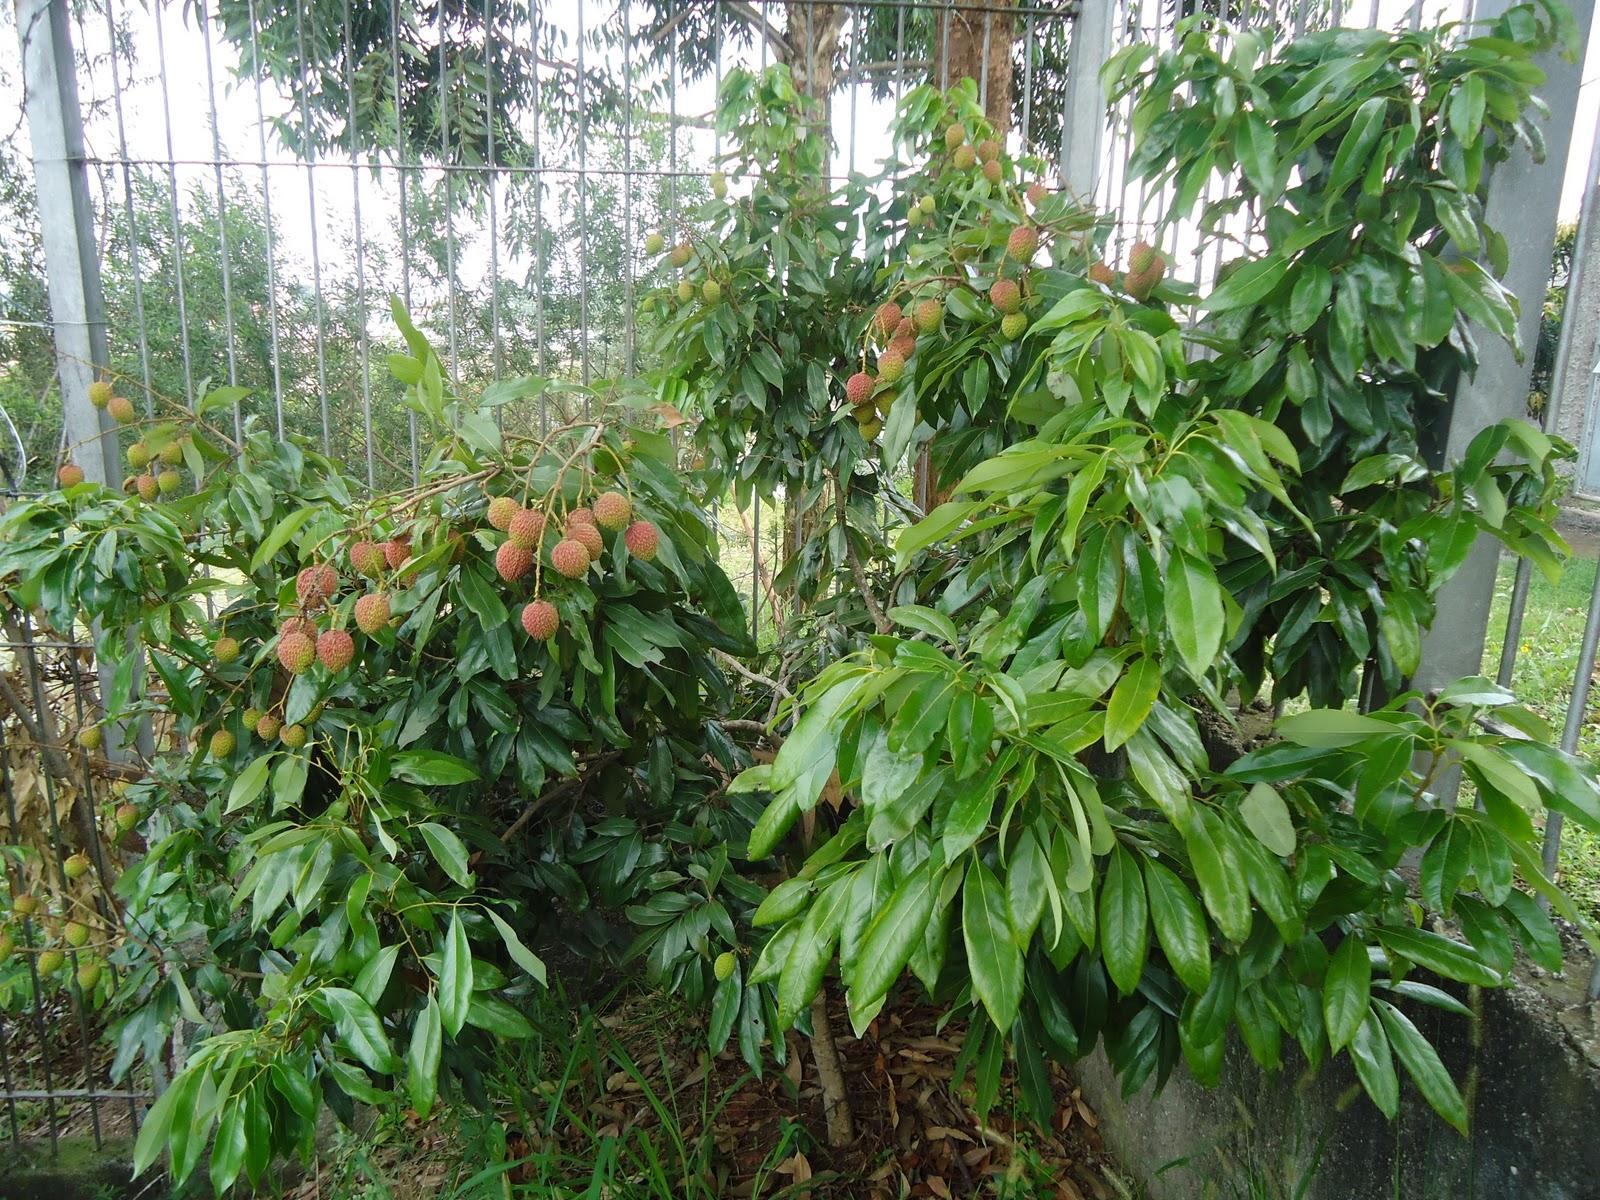 plantas jardim nordeste: : Árvores do pomar de nossa residência [Jardim Nordeste, S.Paulo